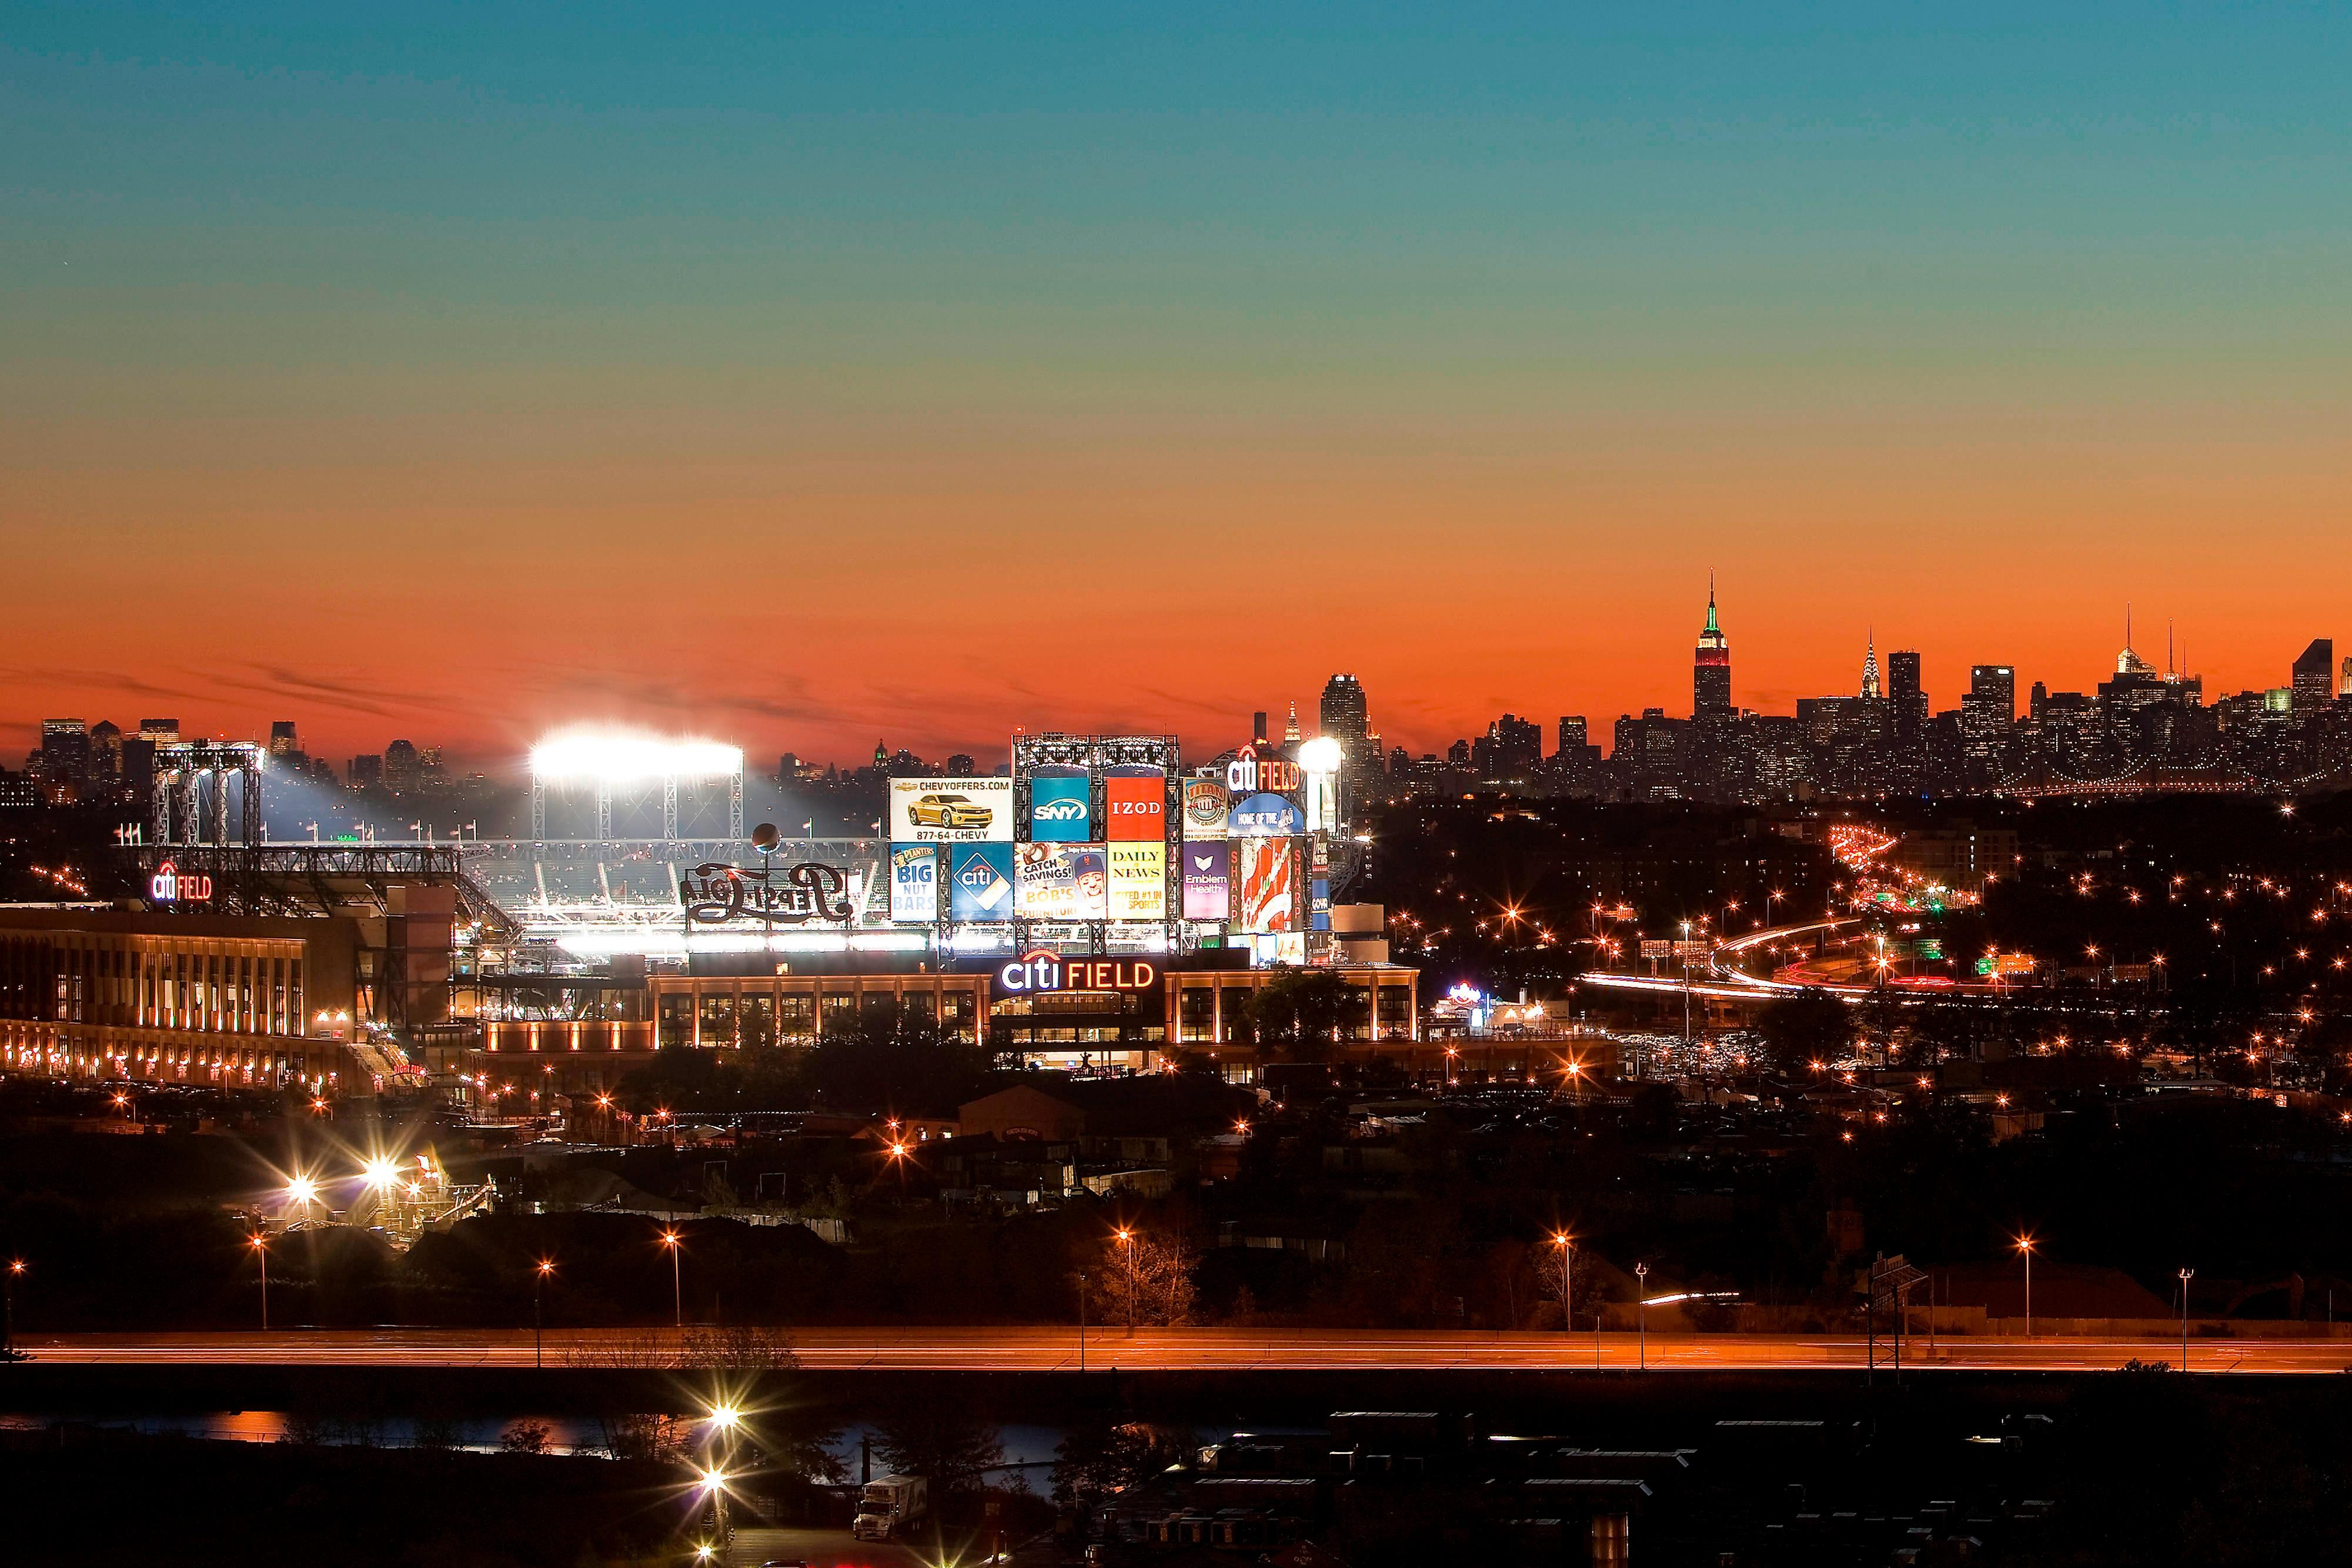 Close to Citifield Baseball Stadium - home of the New York Mets